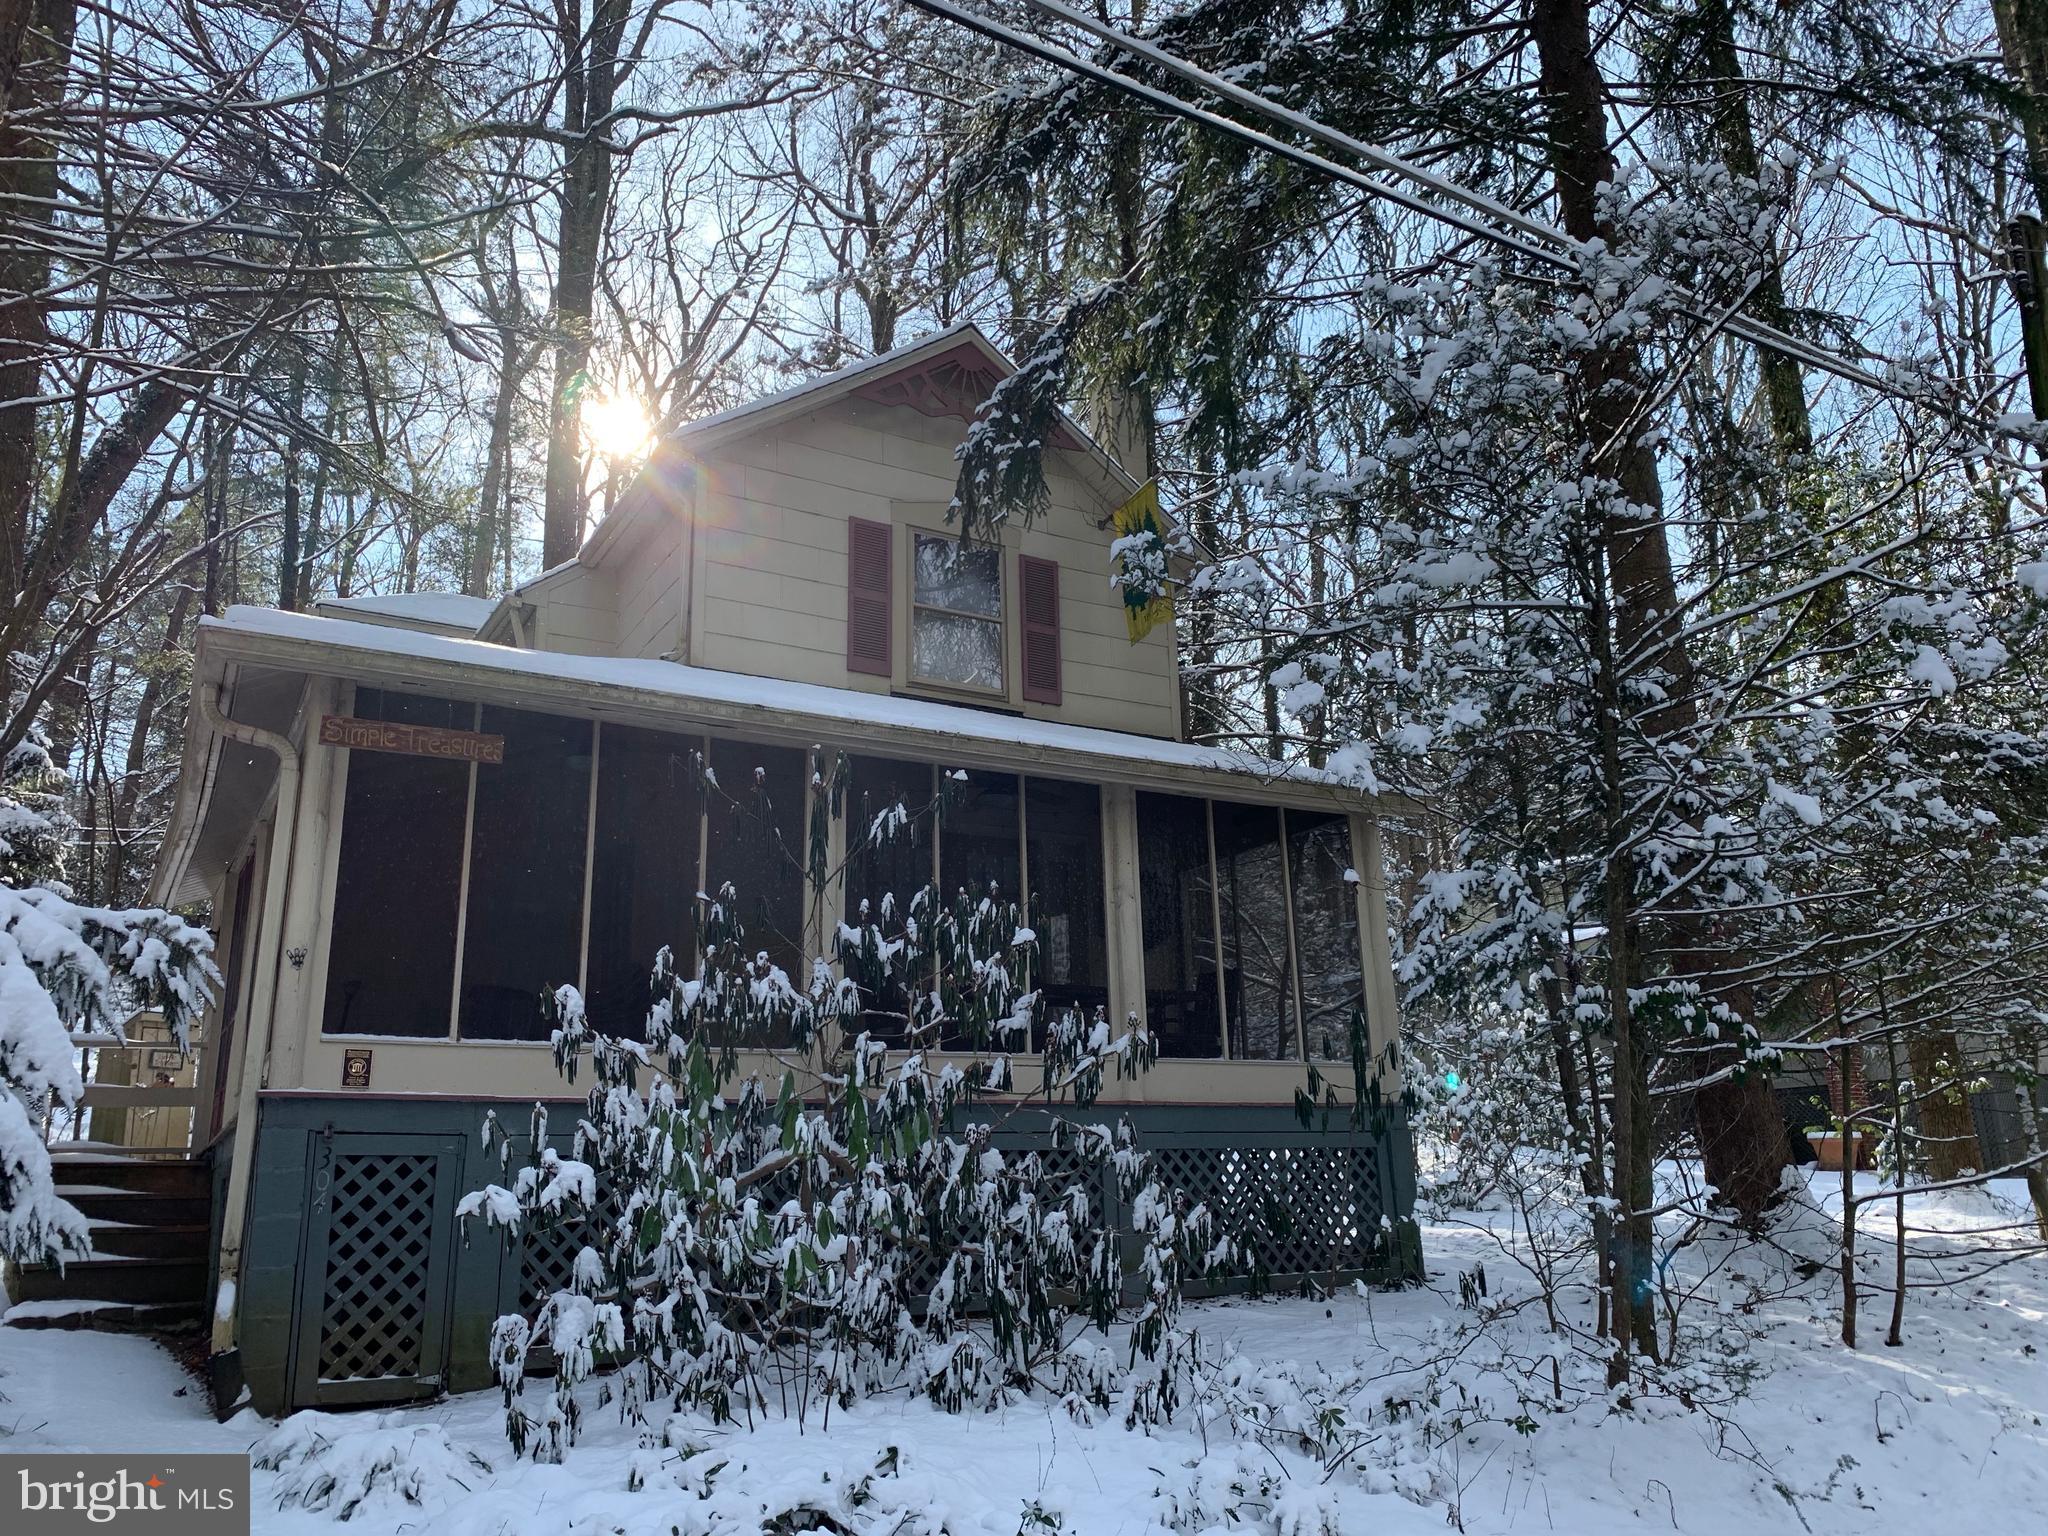 Winter wonderland!  - Front of home